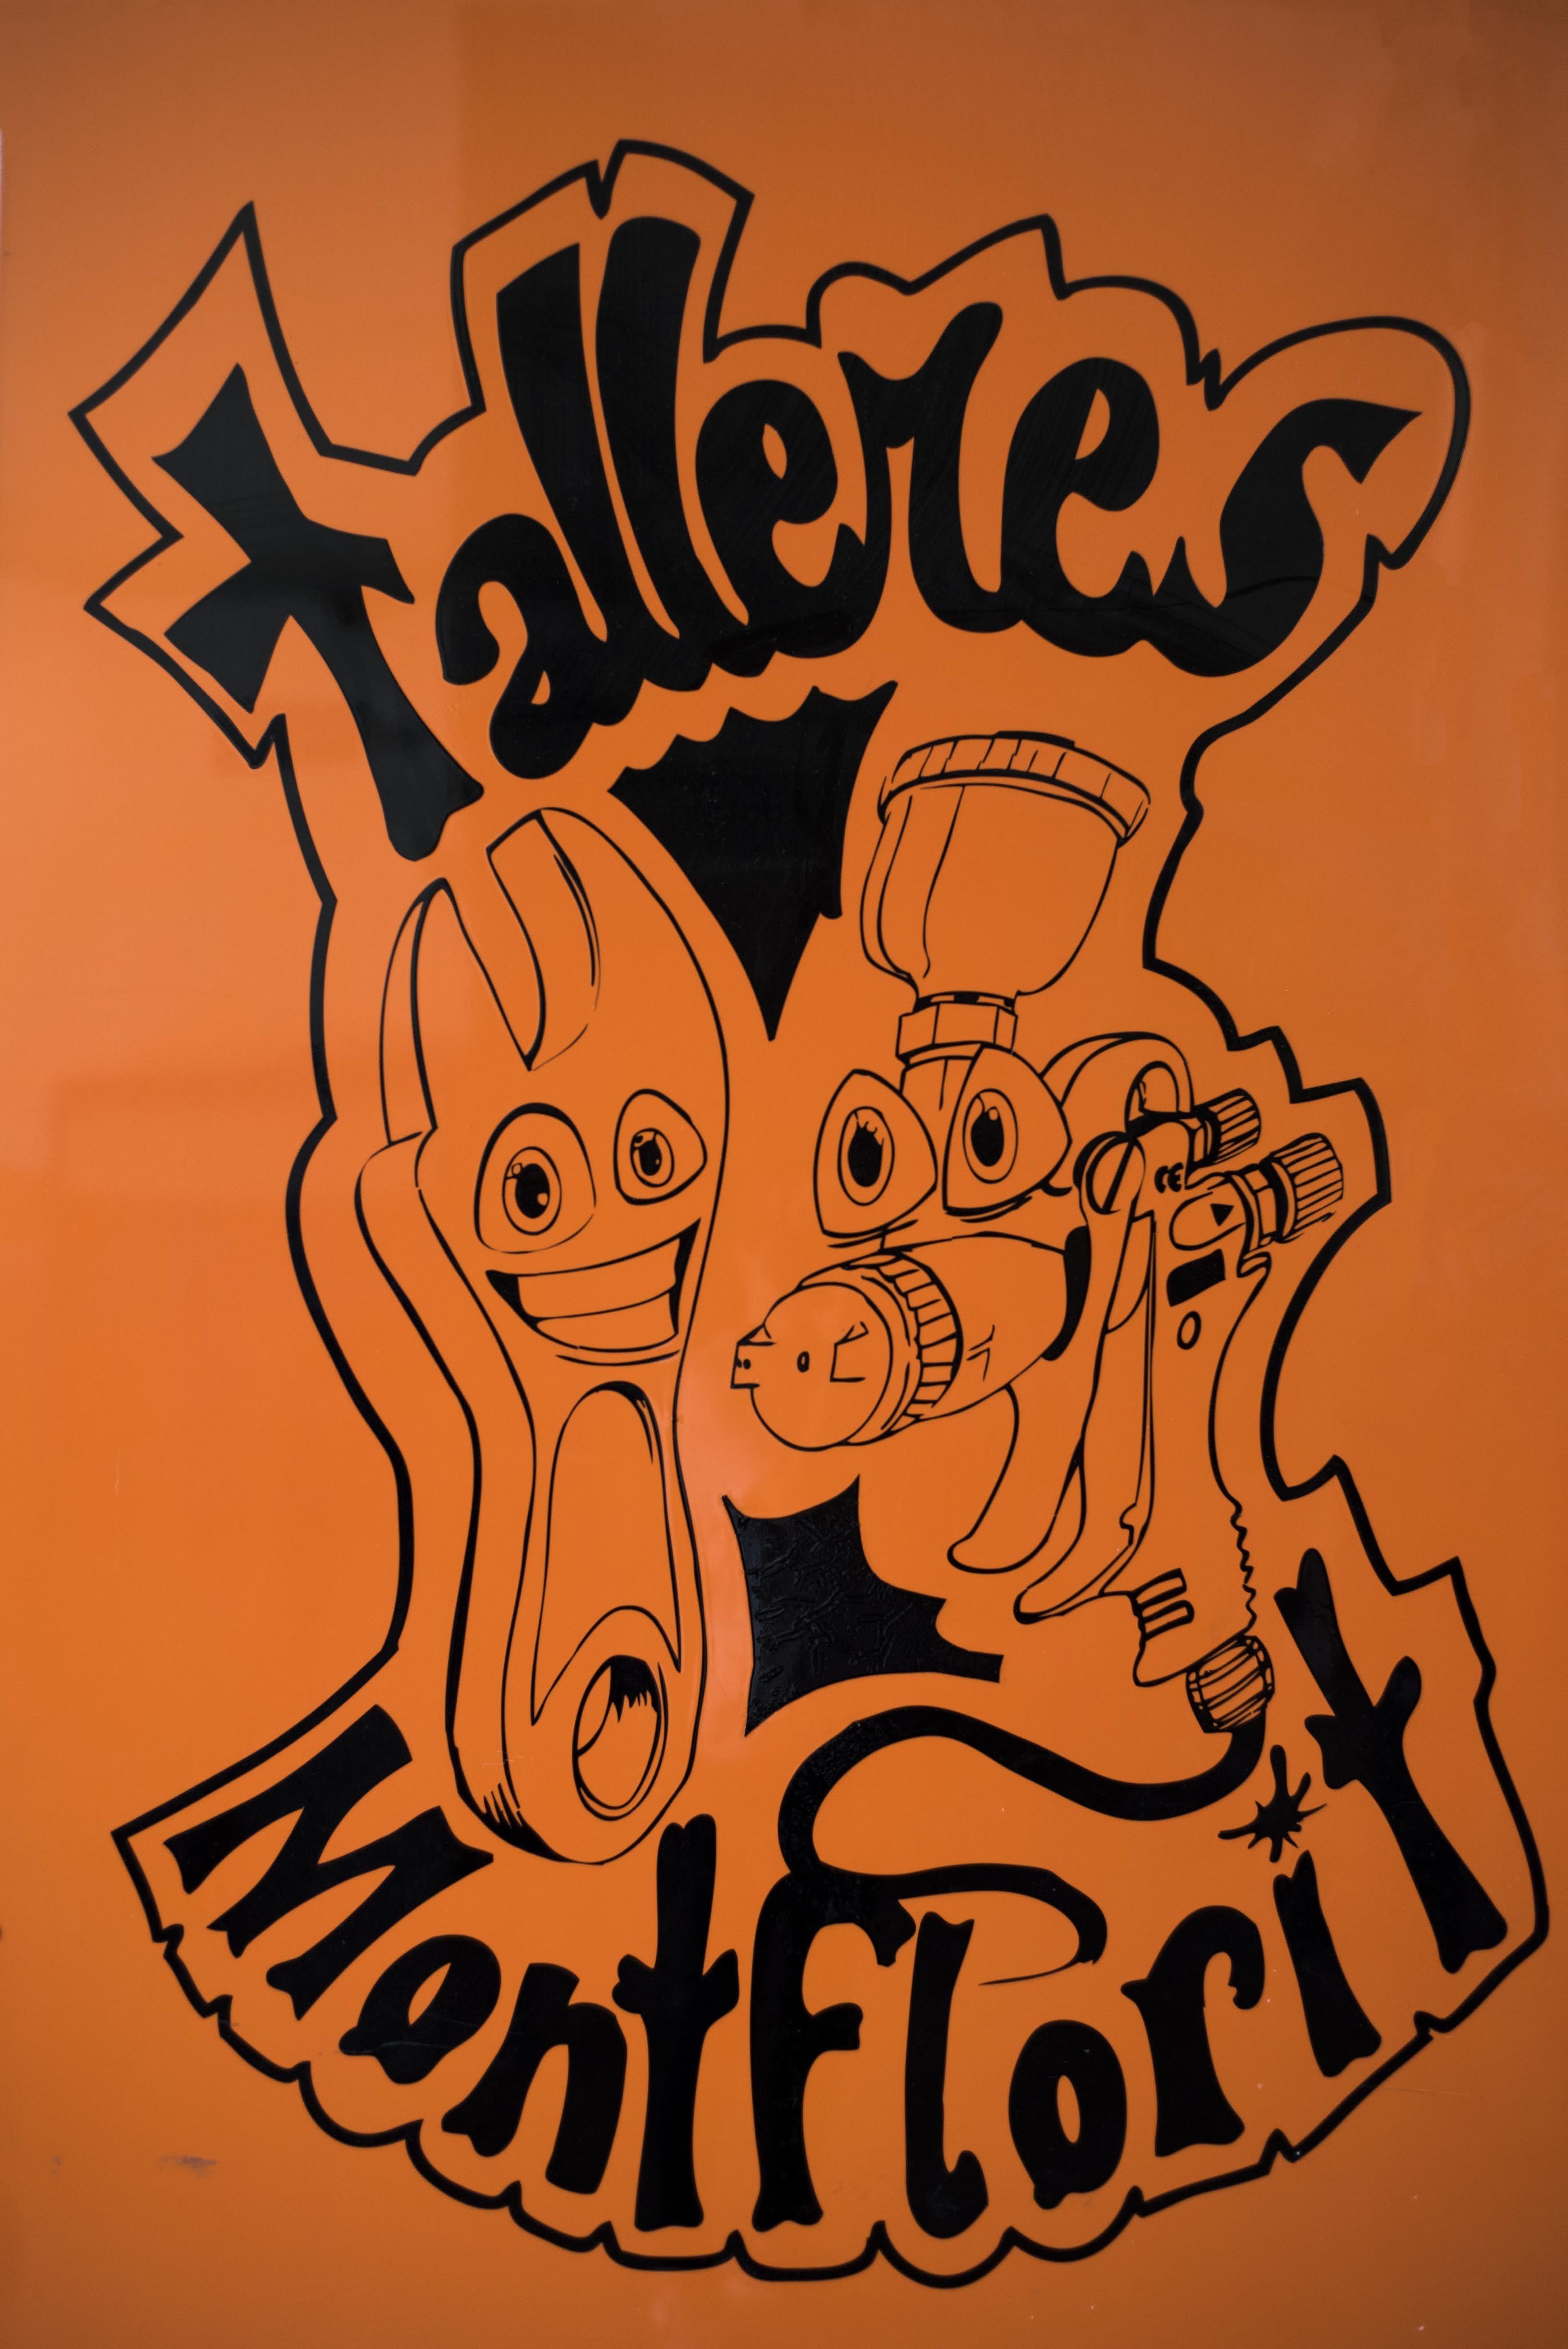 Logotipo publicitario